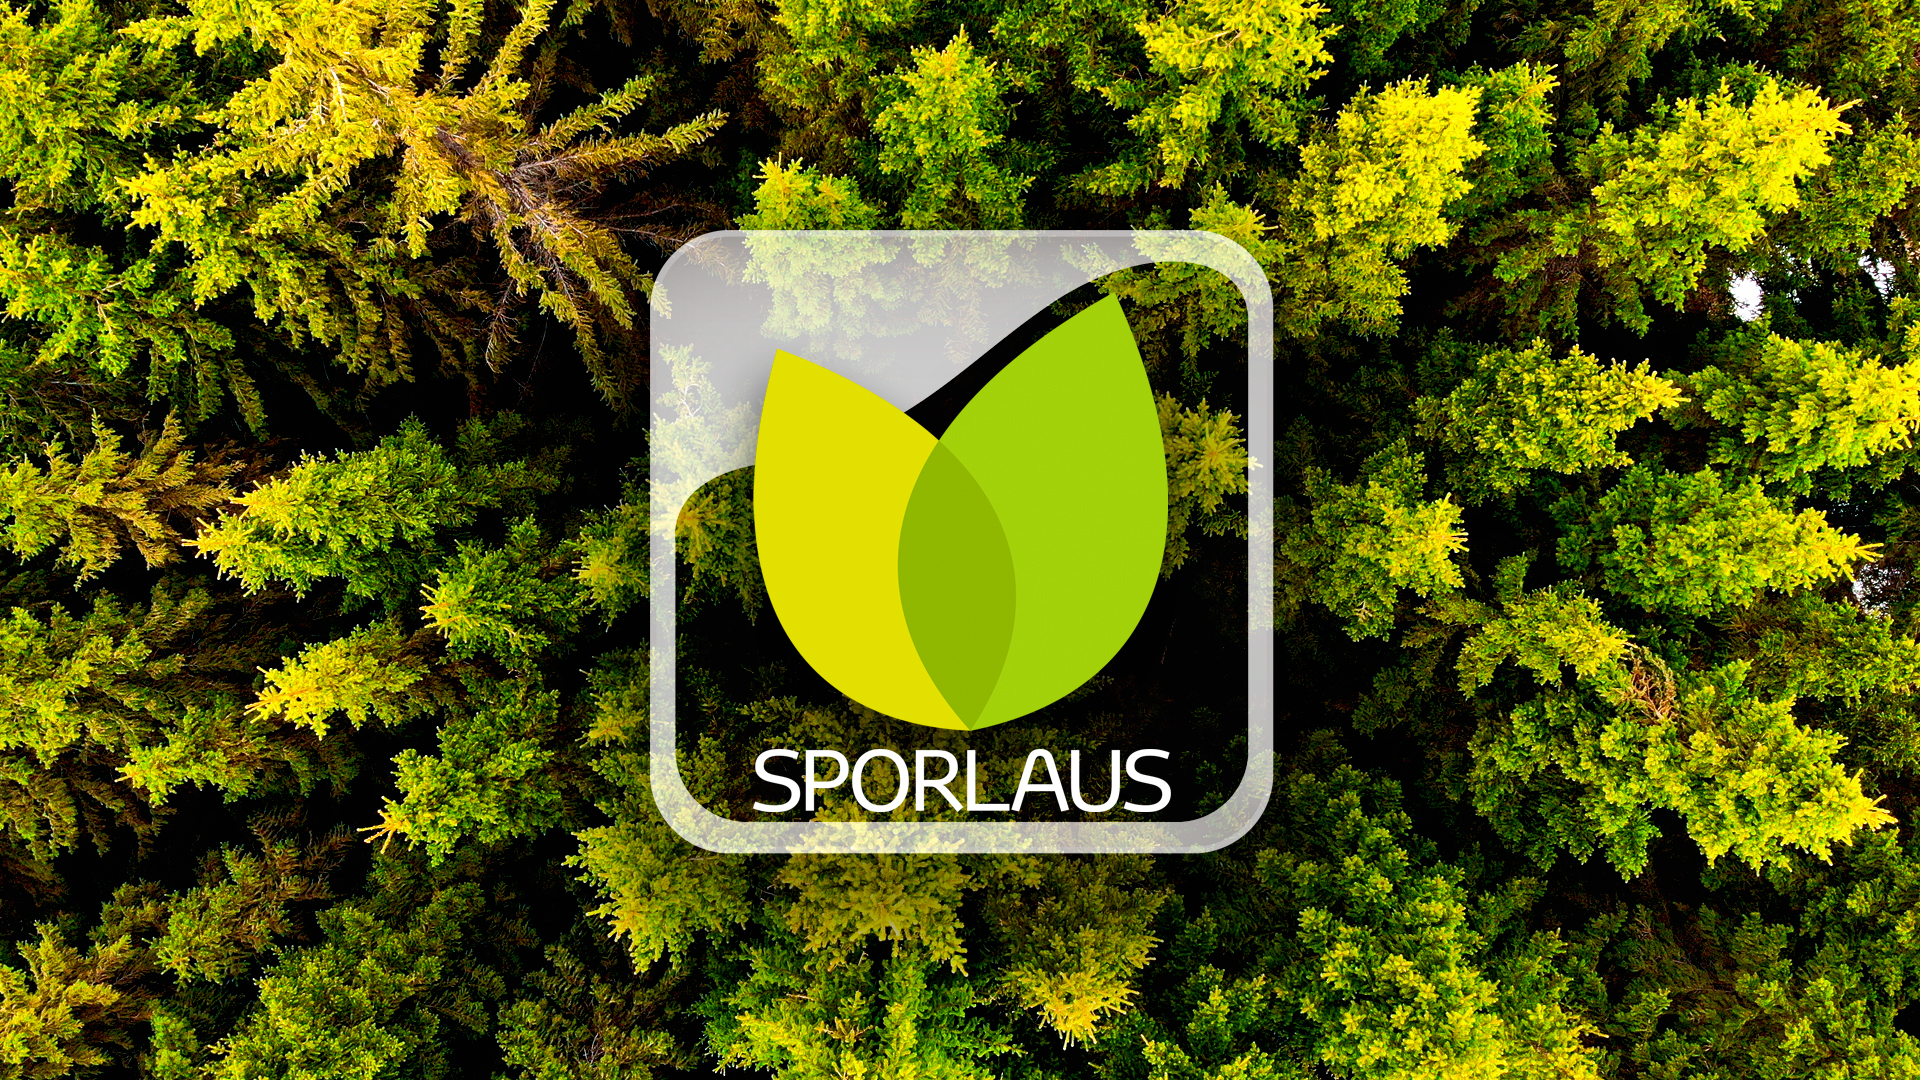 Sporlaus